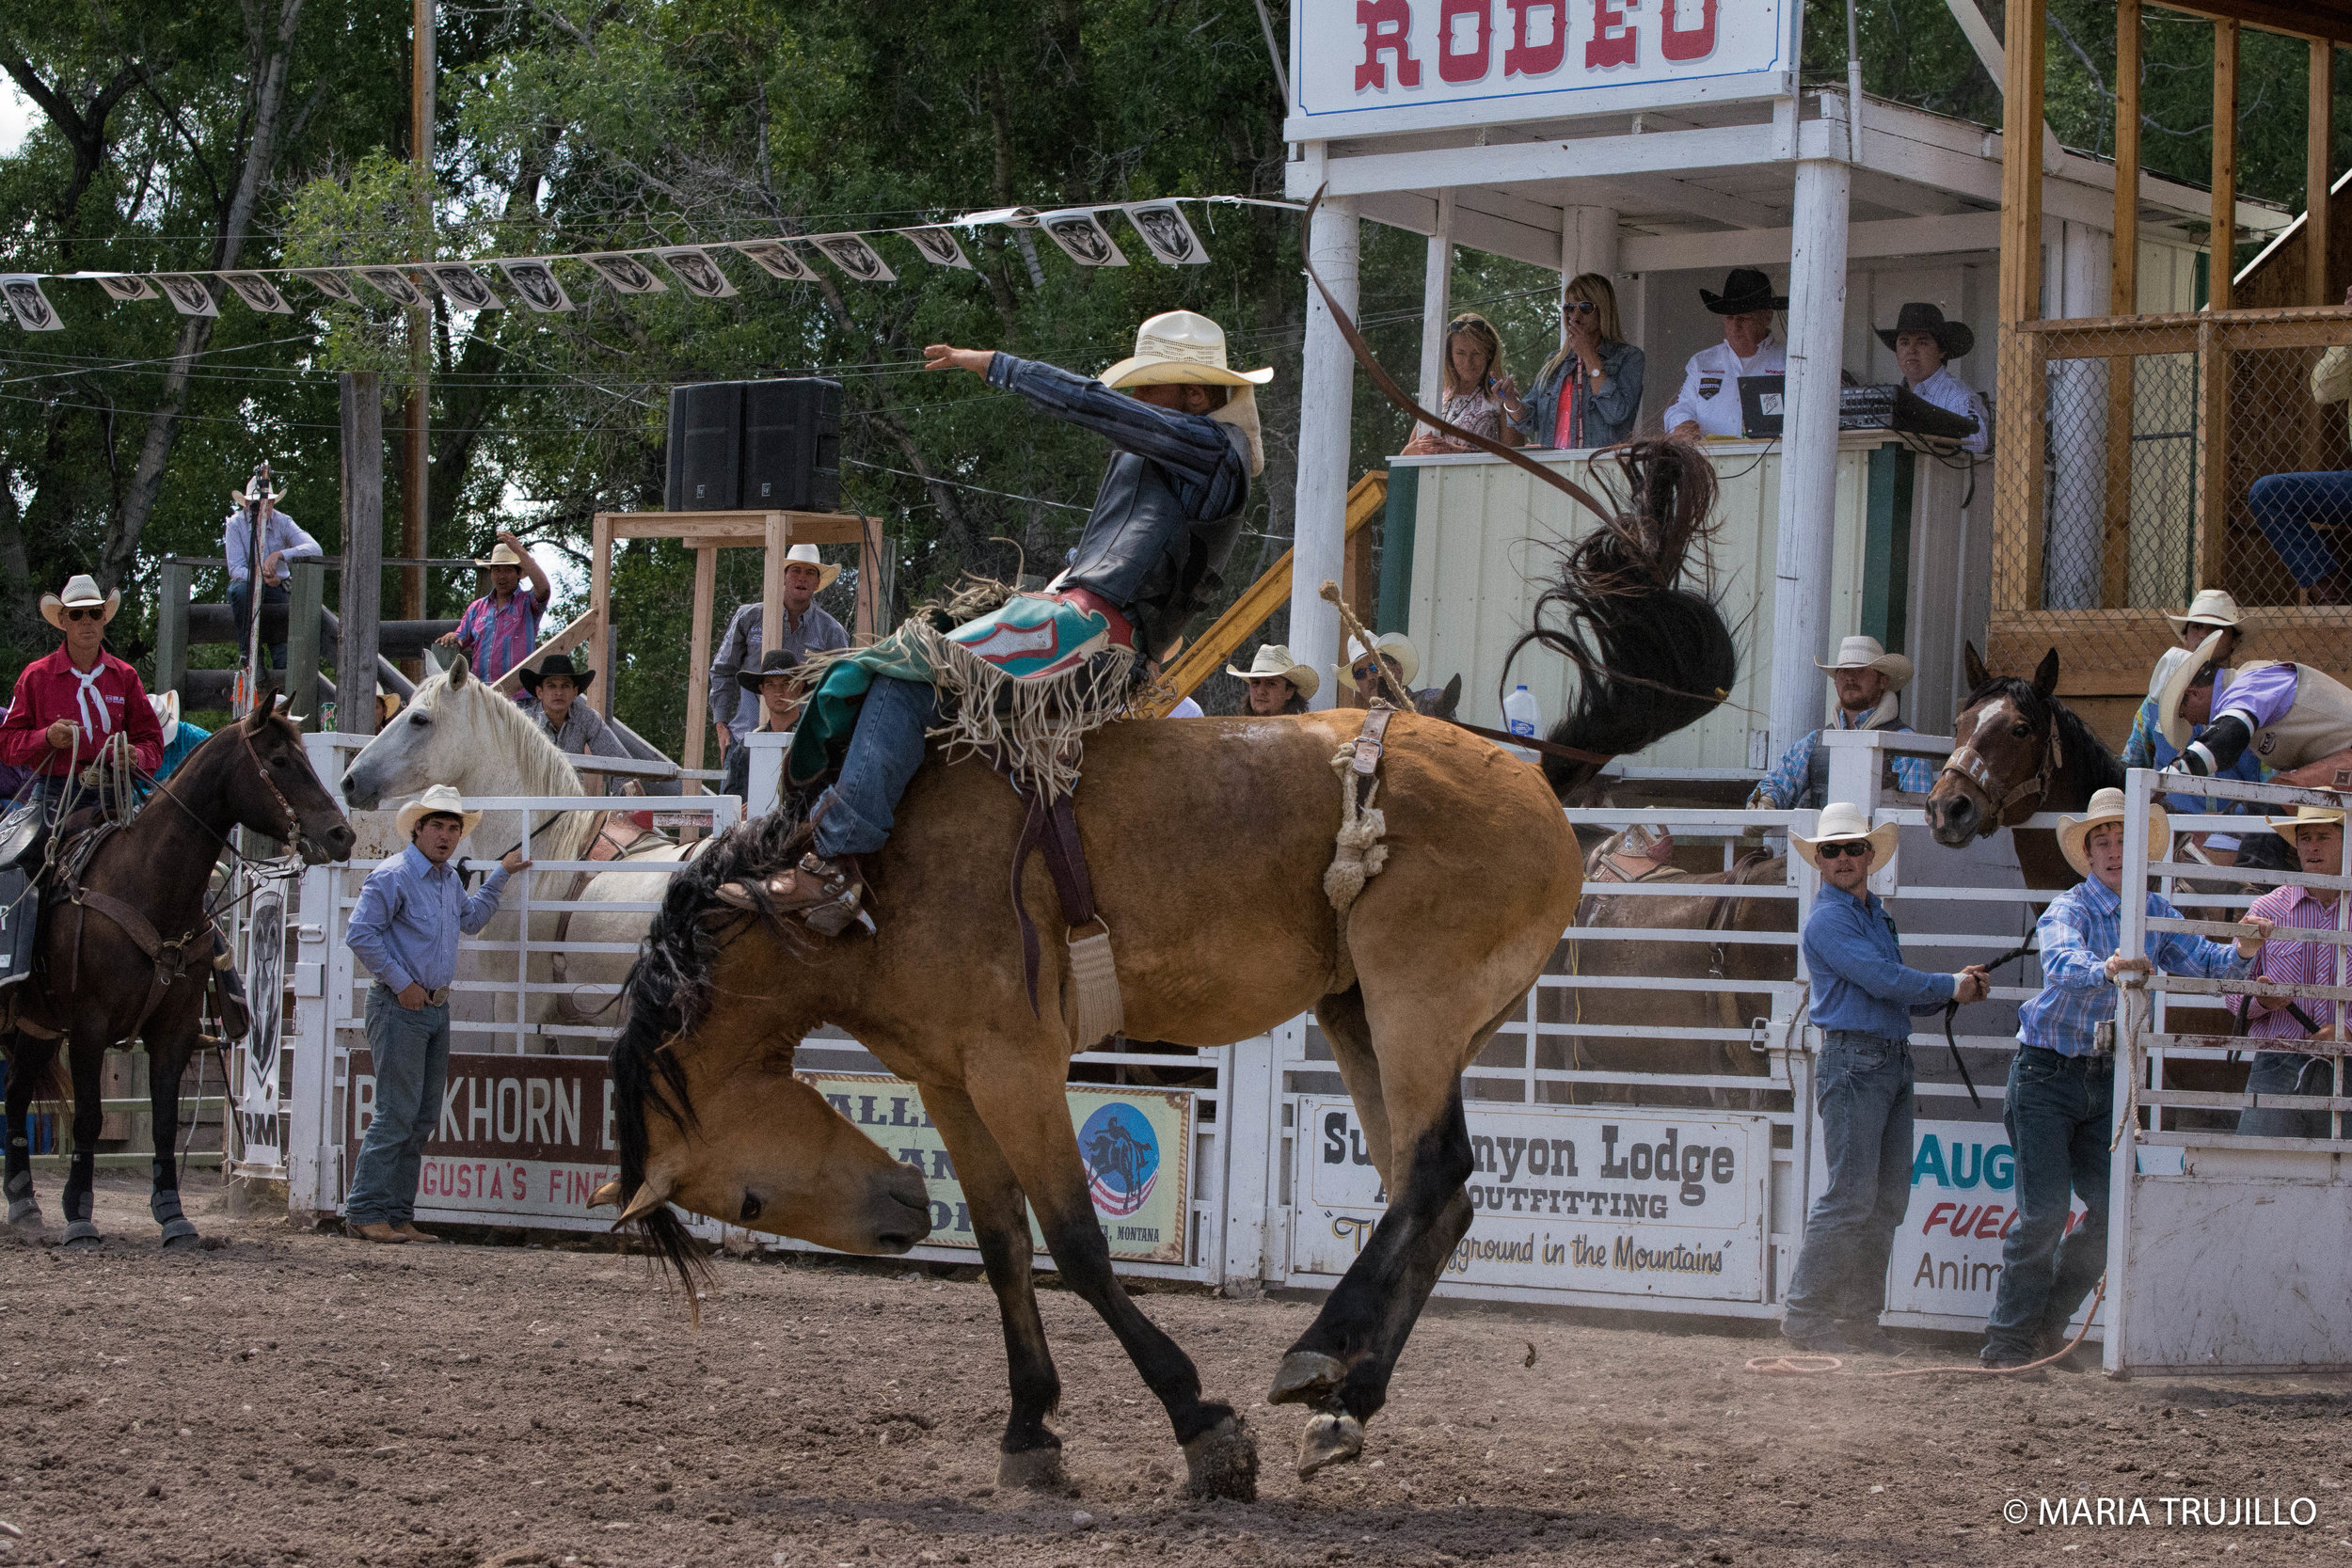 augusta rodeo 2016-36.jpg